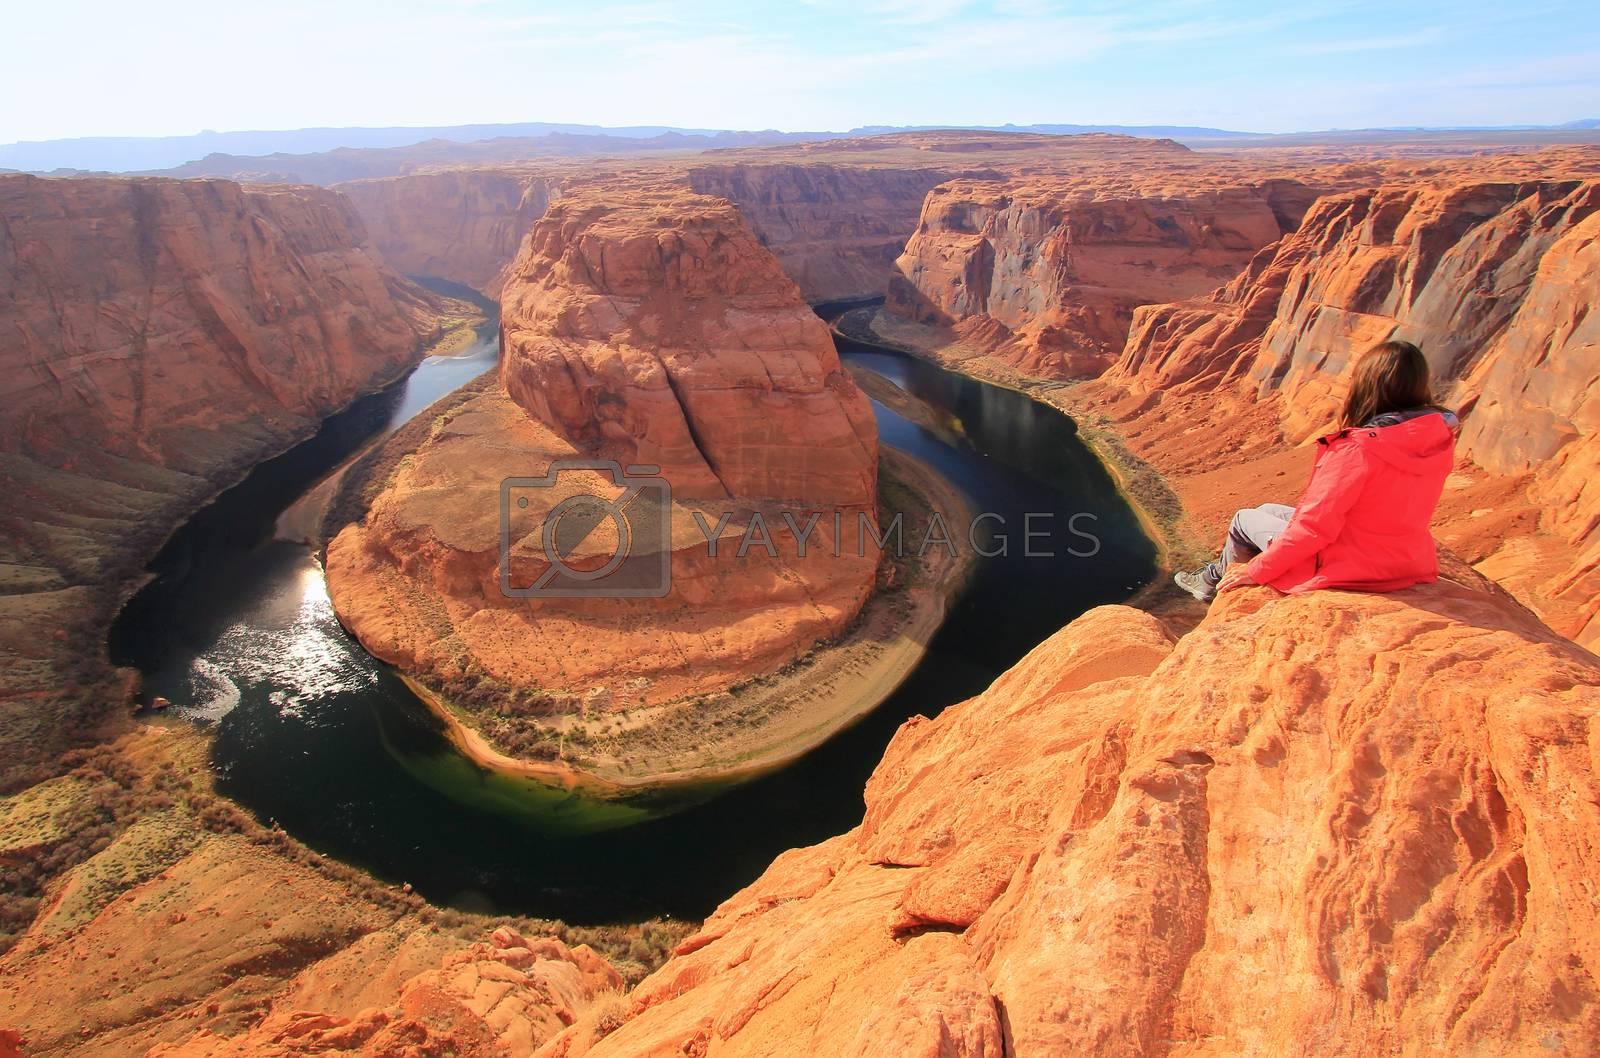 Royalty free image of Young woman enjoying view of Horseshoe bend, Arizona, USA by donya_nedomam